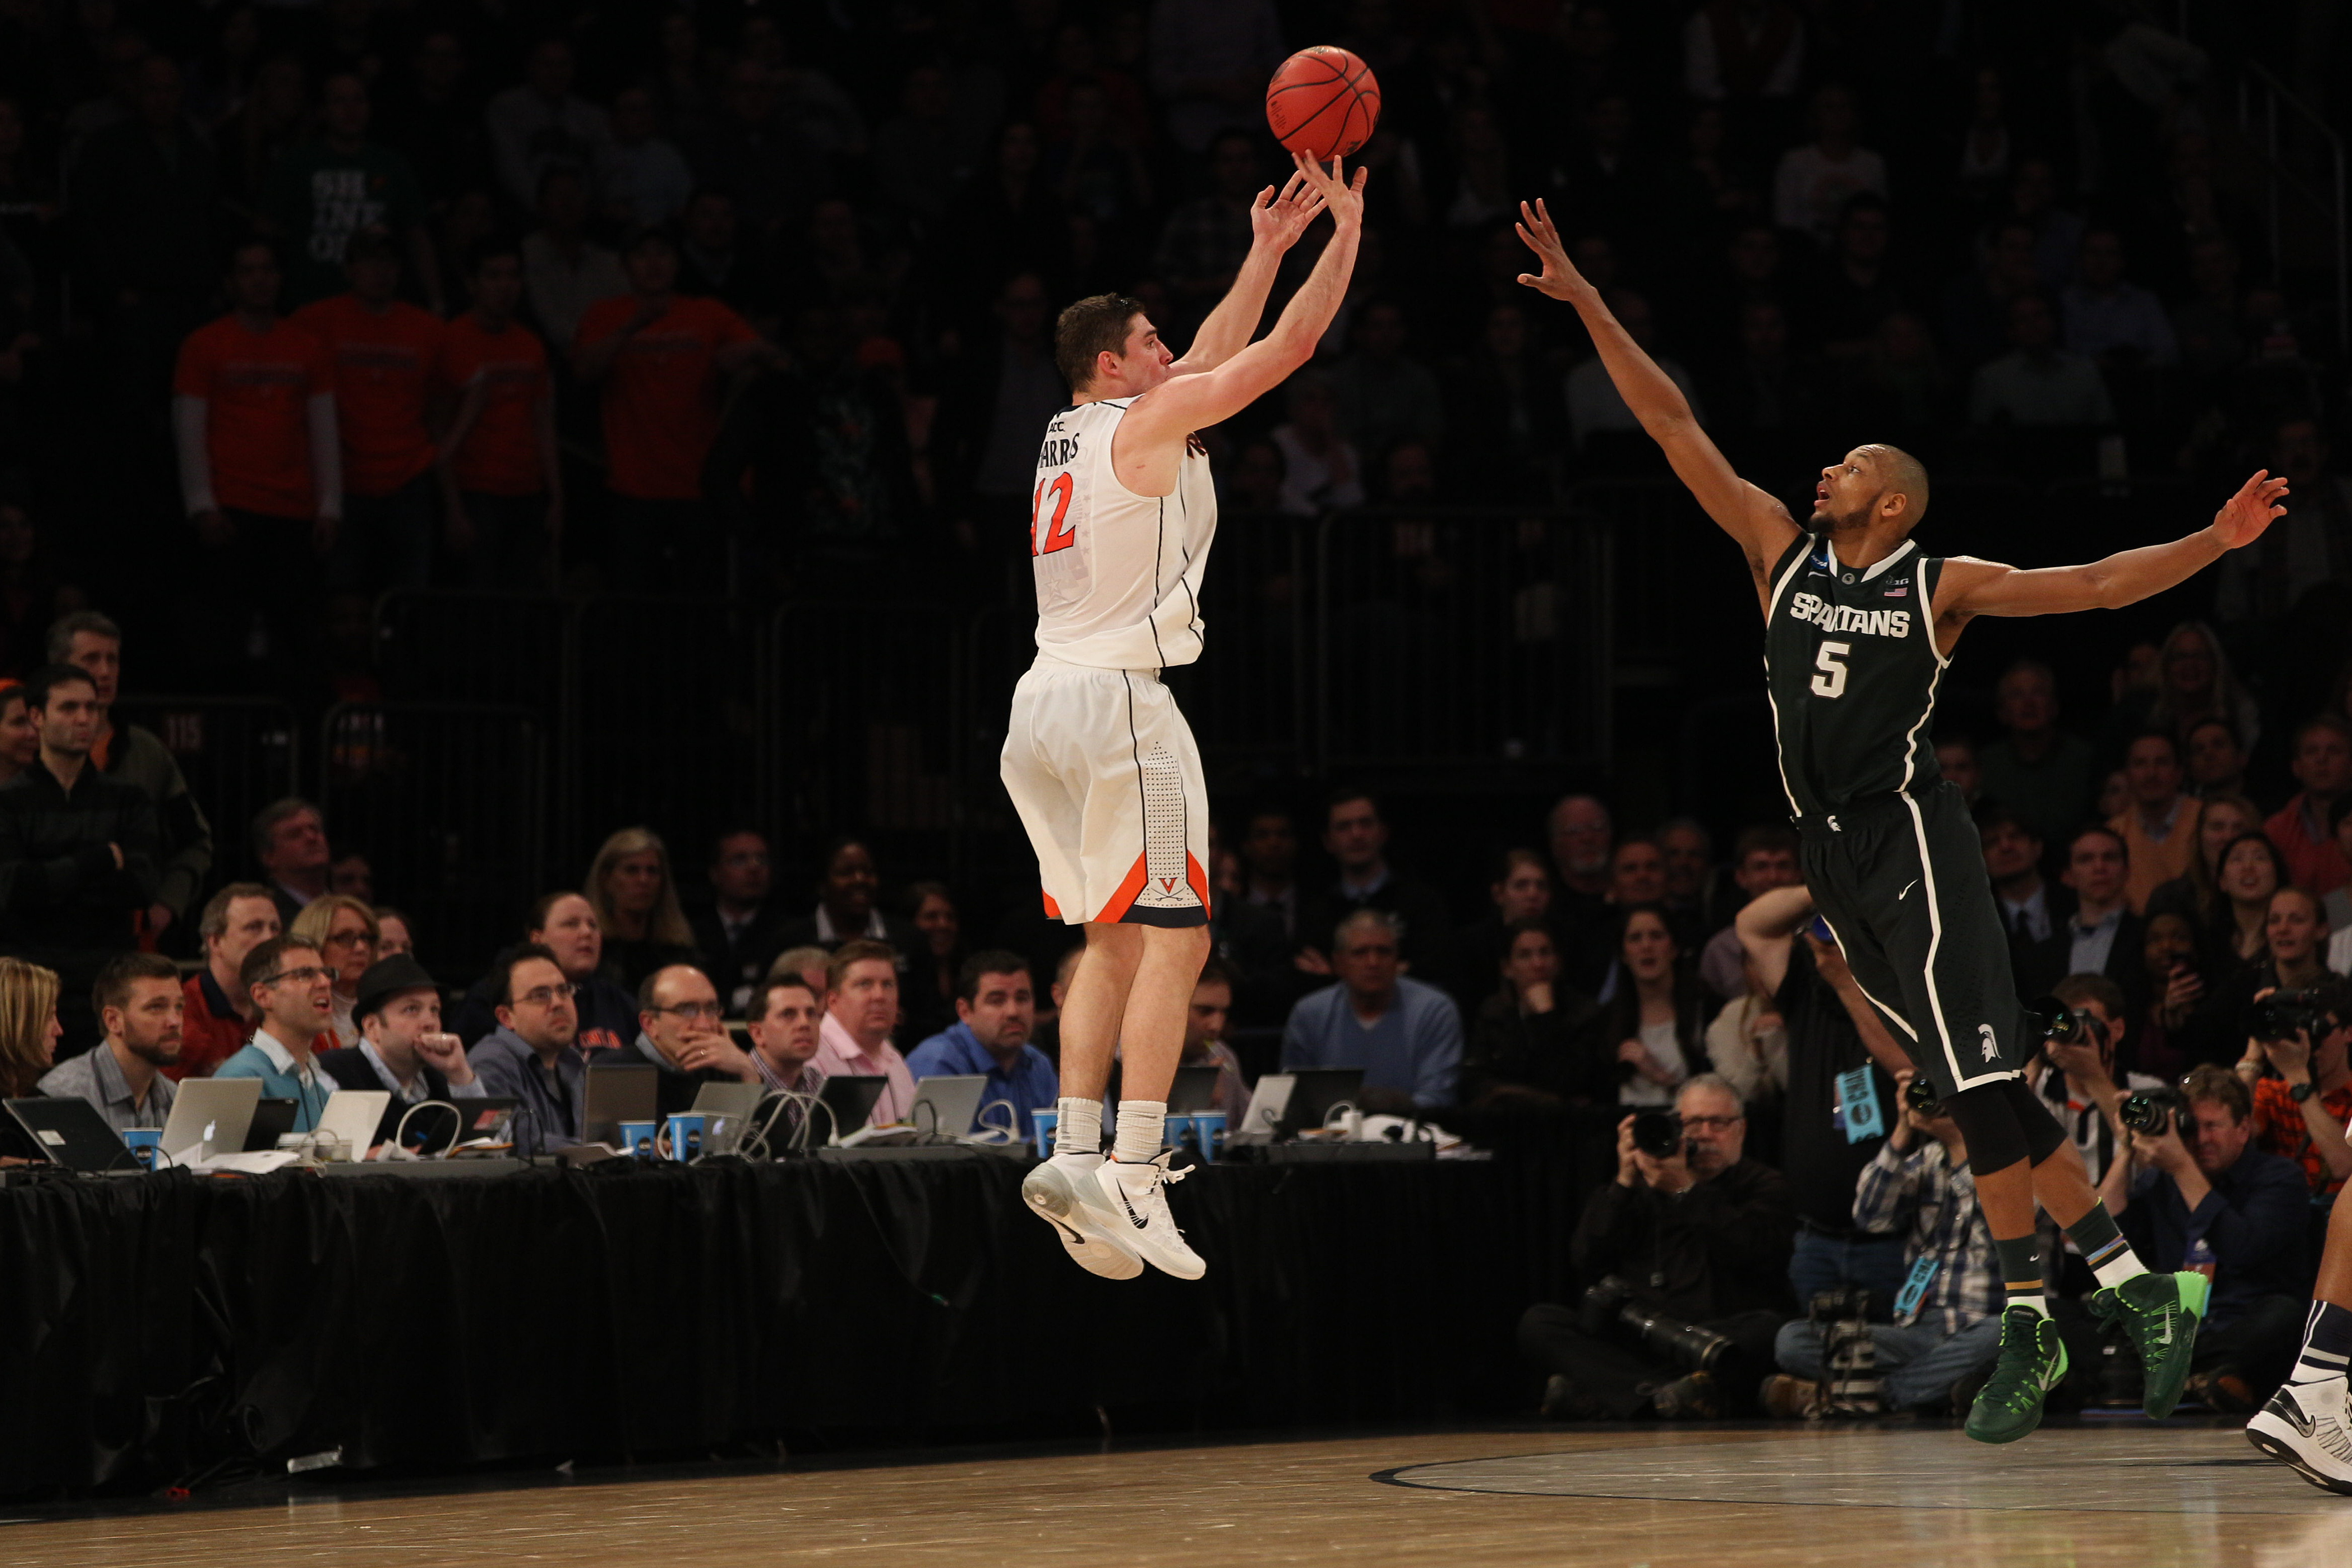 2014 NCAA Division 1 Men's Basketball Championship, East Regional at Madison Square Garden, New York